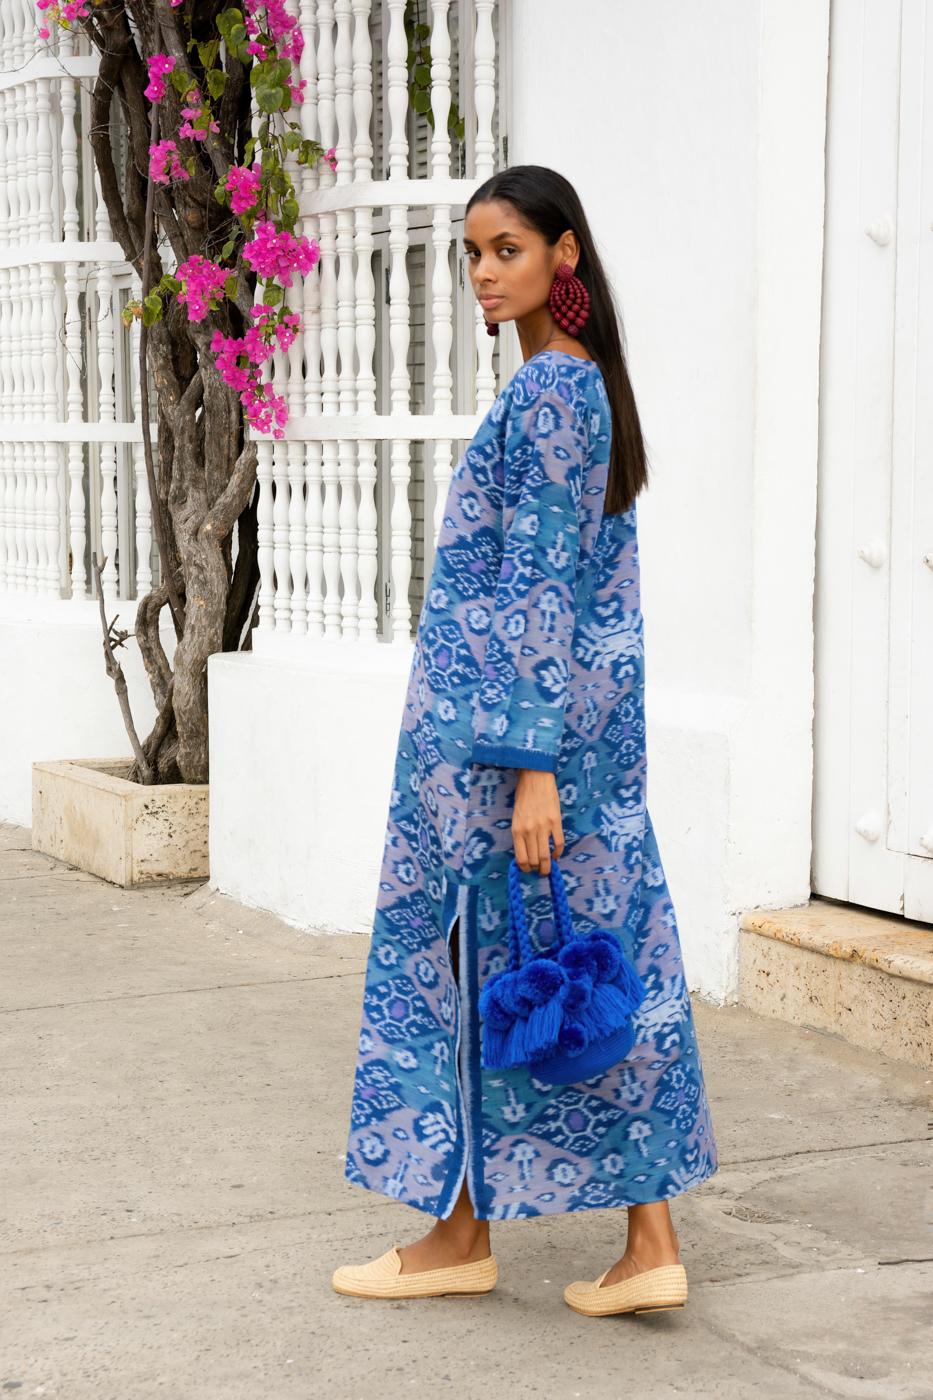 Vestido en tela de ikat